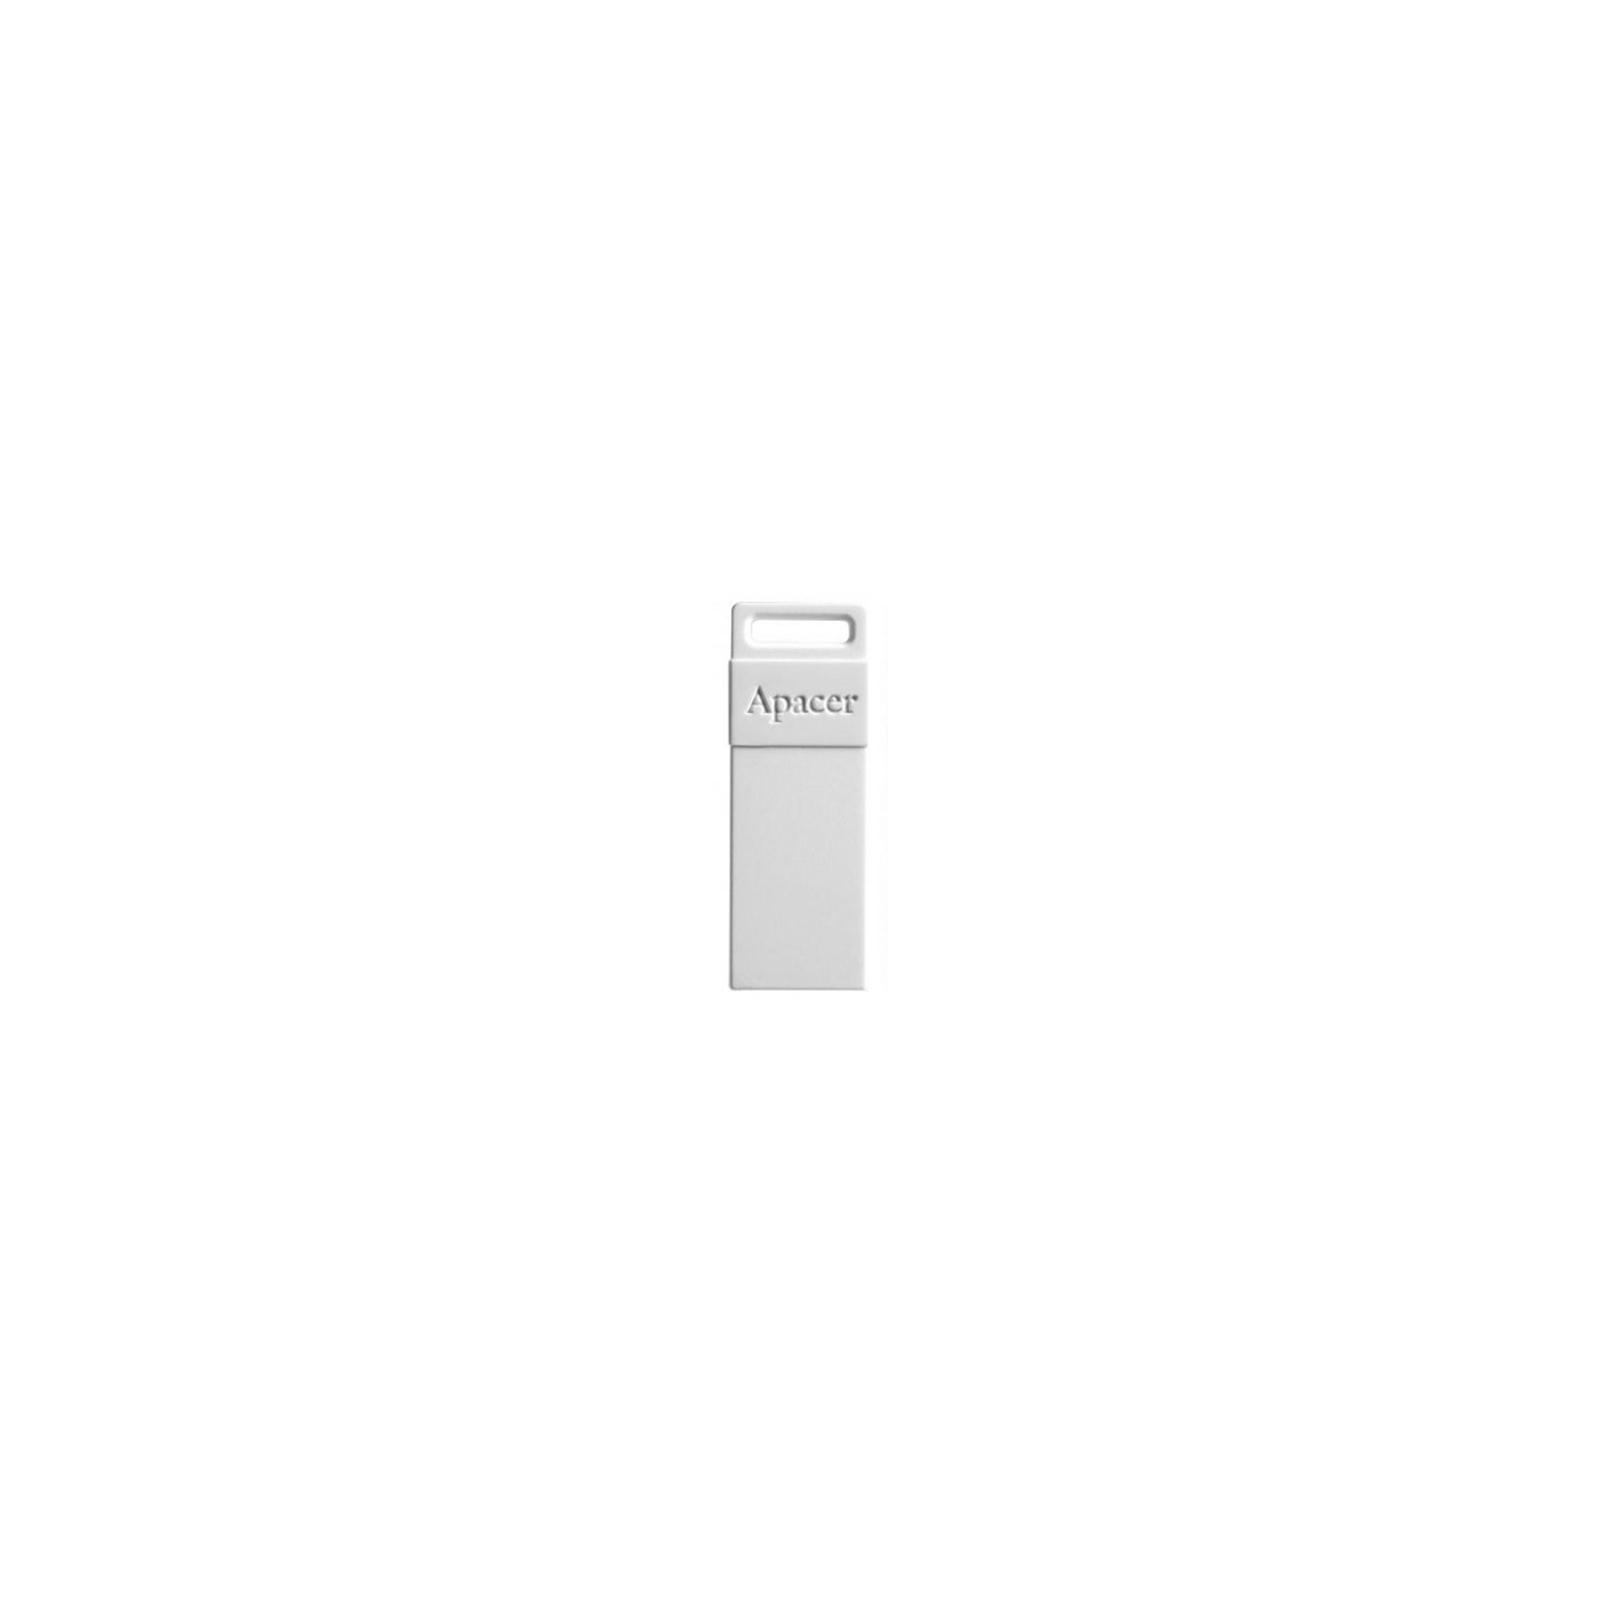 USB флеш накопитель 8GB AH110 White RP USB2.0 Apacer (AP8GAH110W-1)